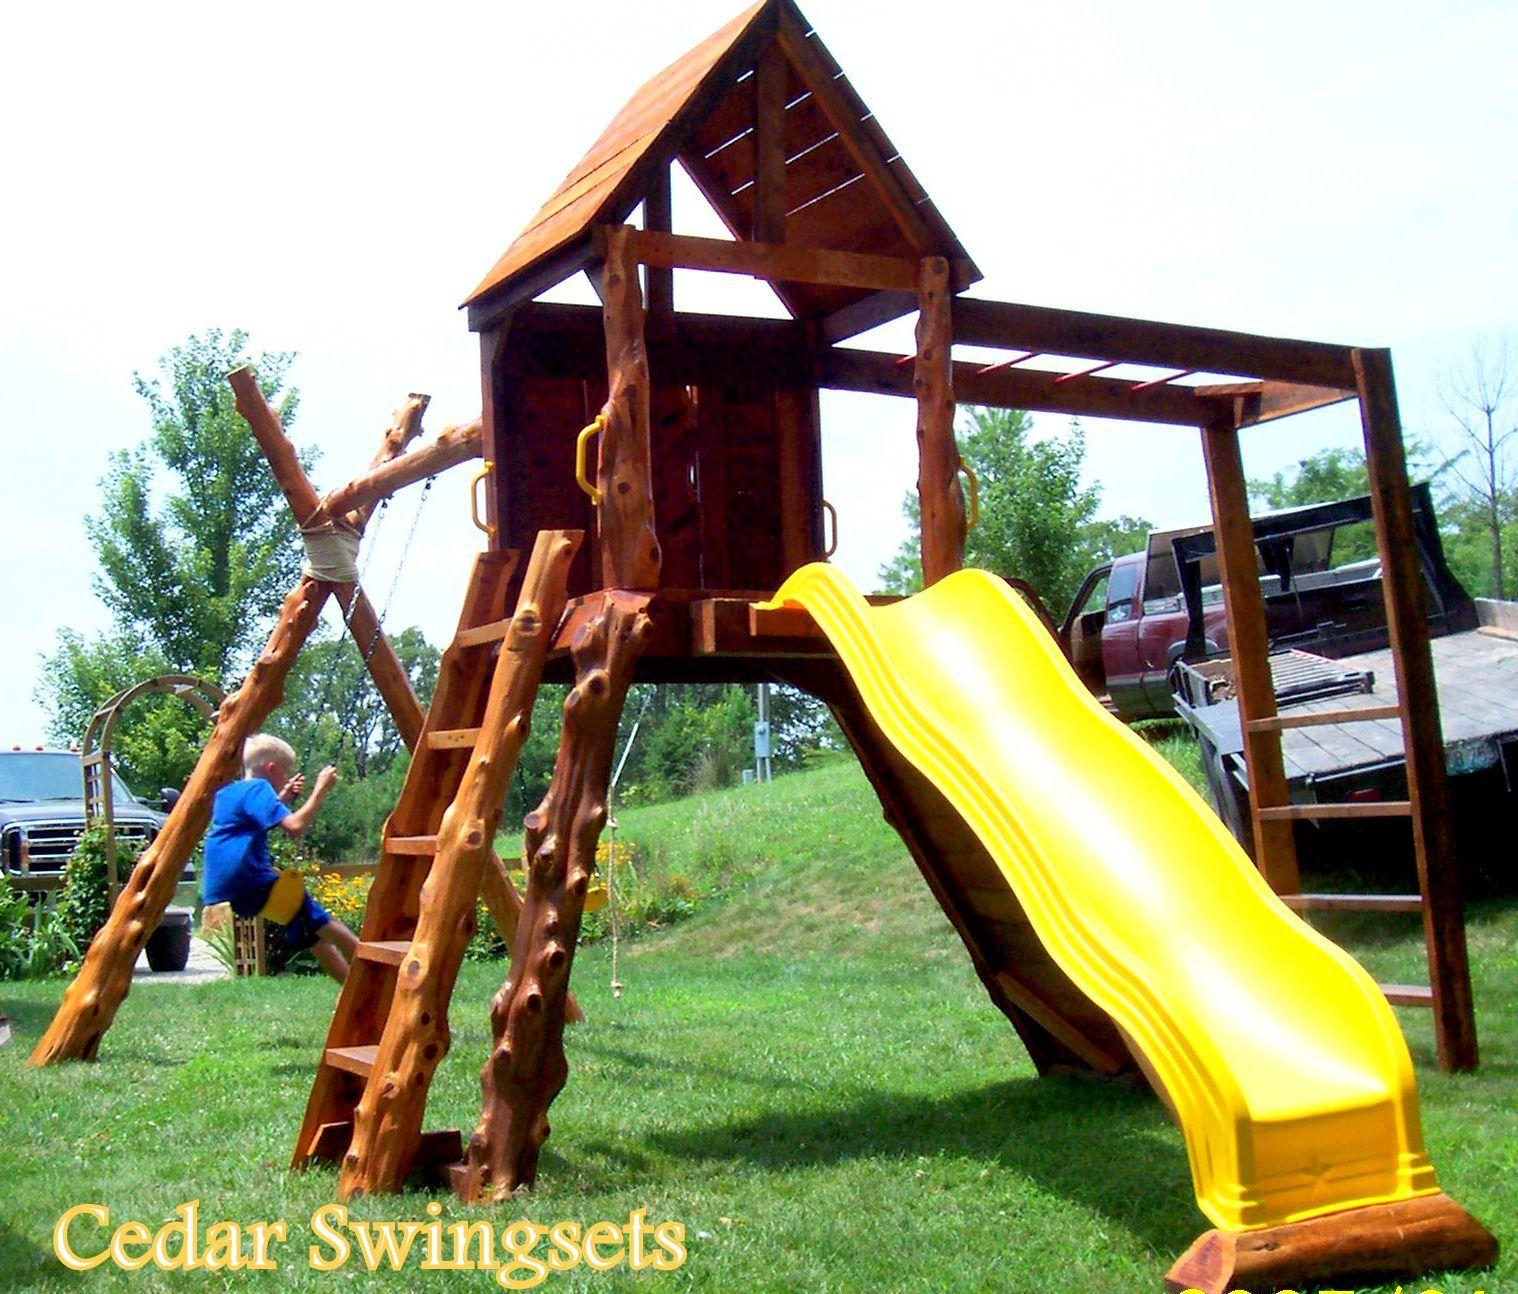 Cedar Log Swing Set Favorite Rustic Furniture